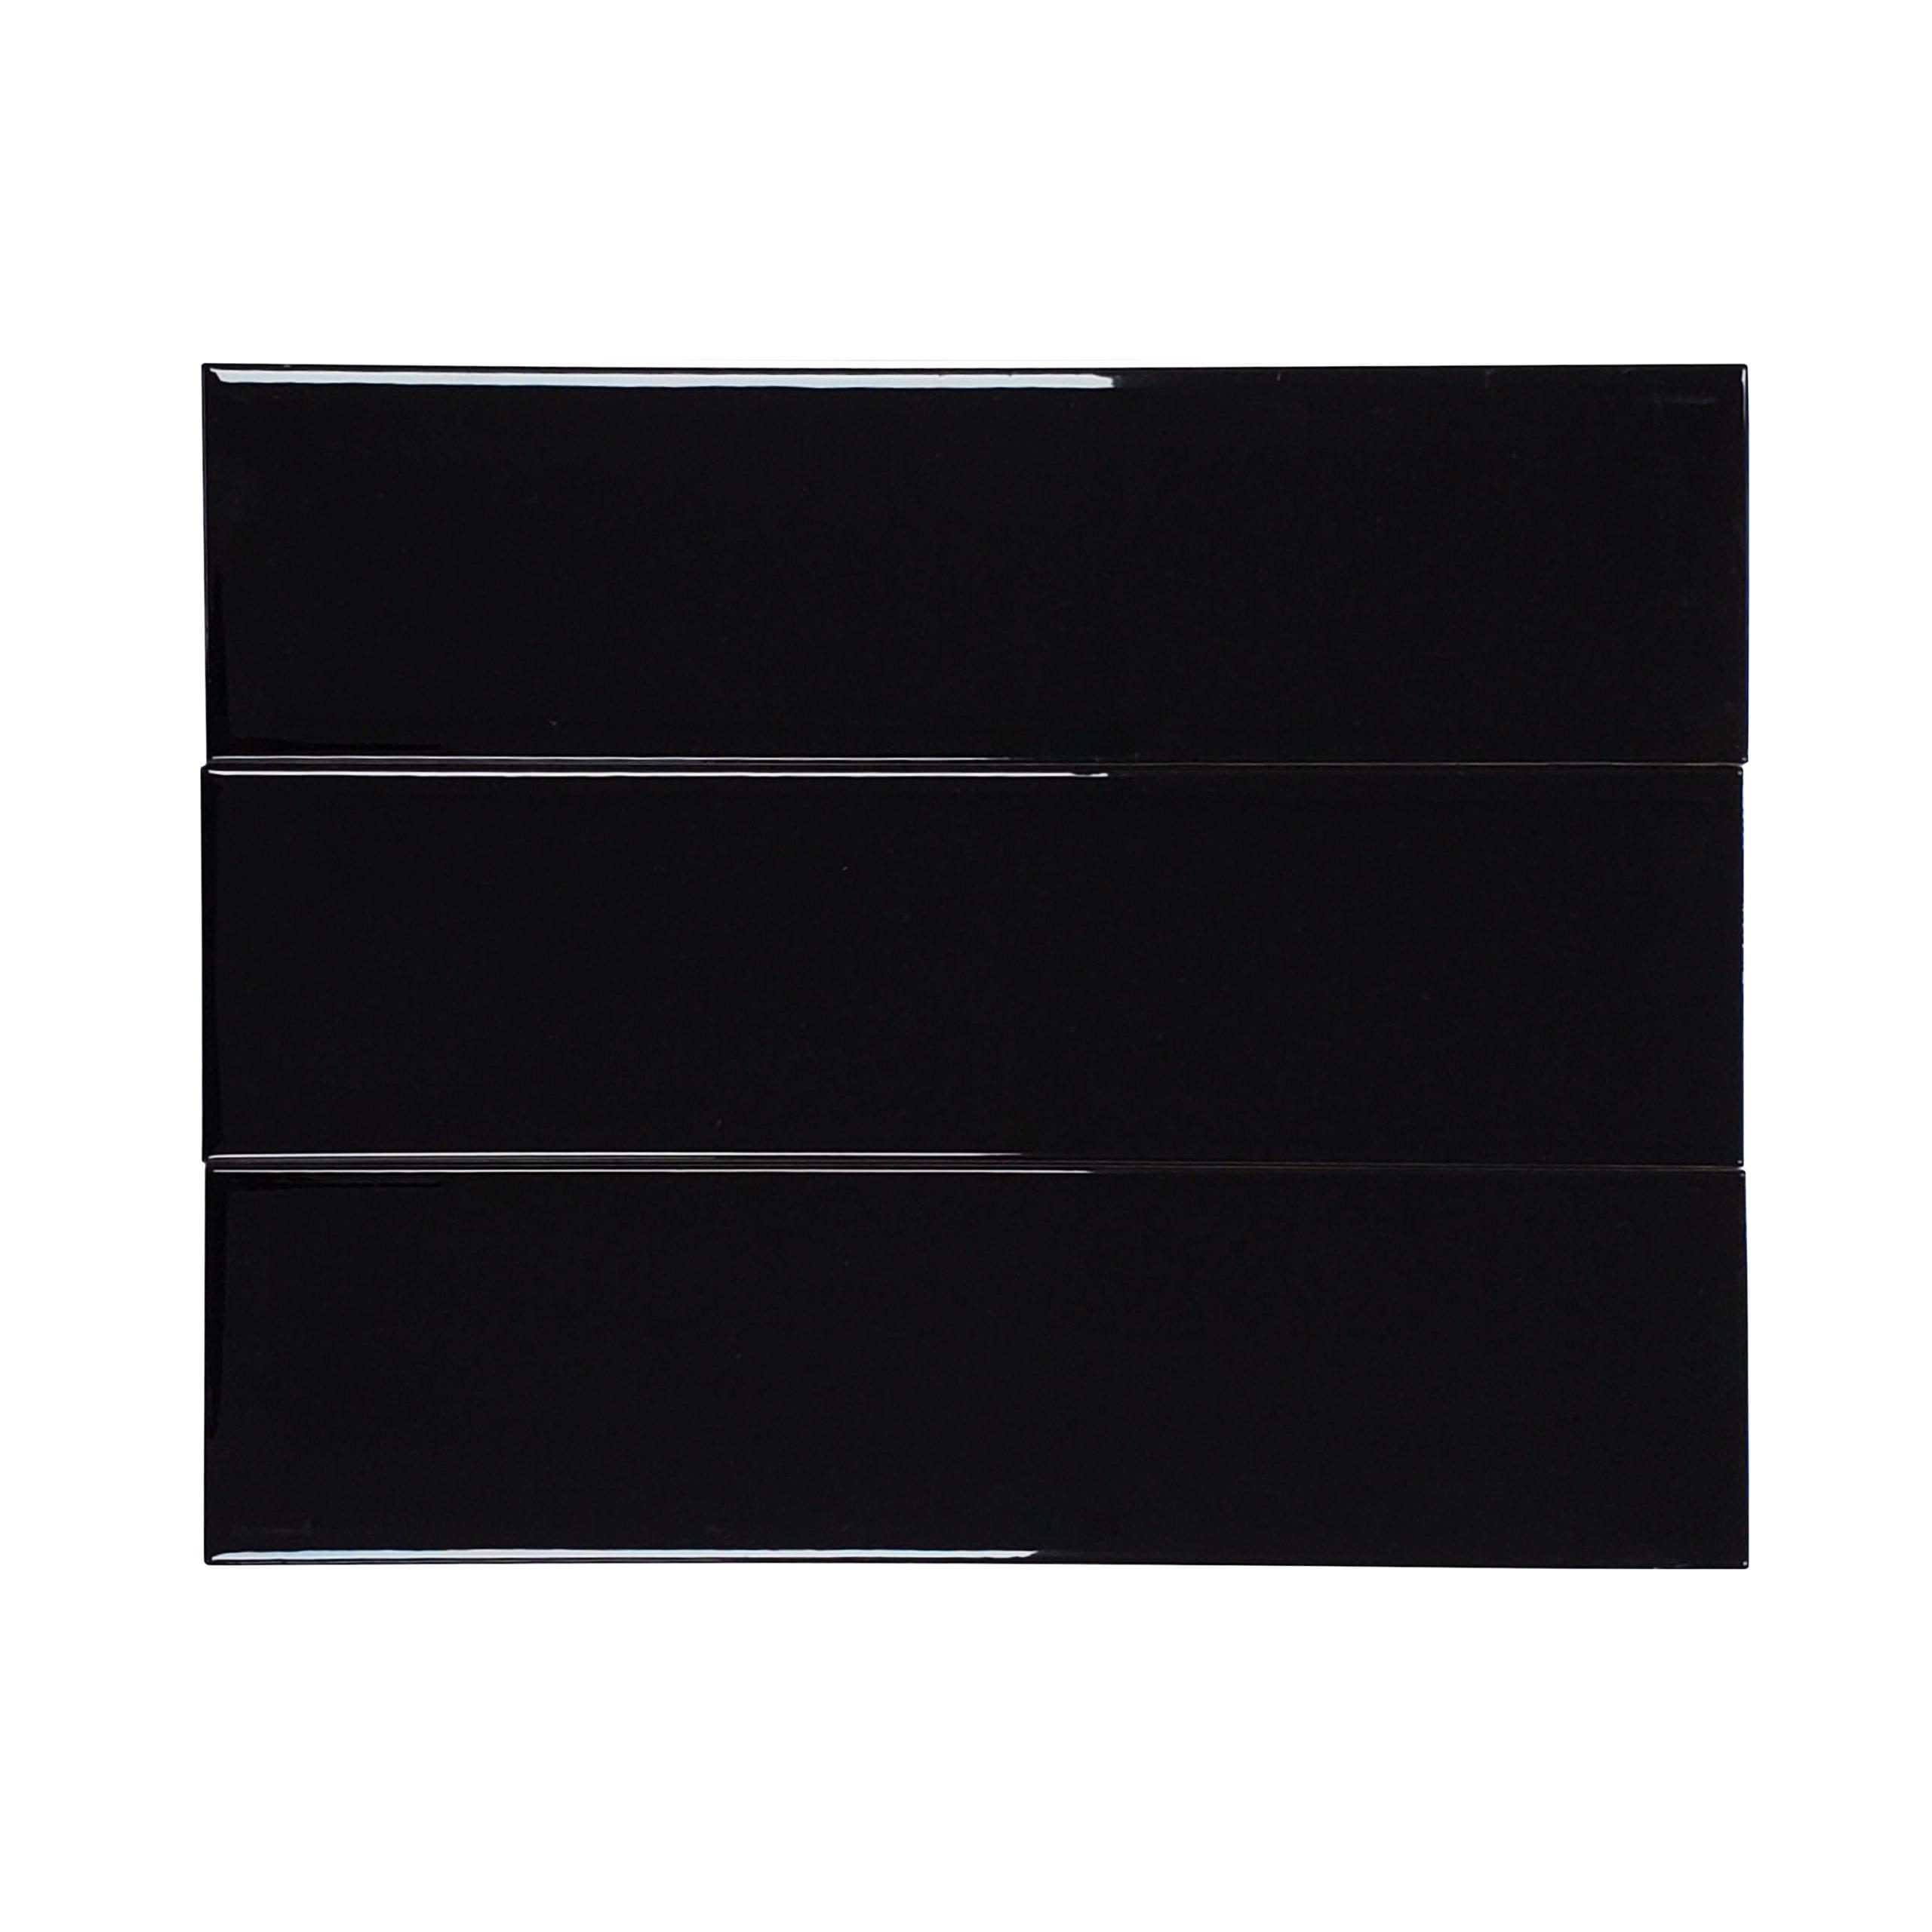 4×16 Flat Glossy Subway Tile_Black_10.33sfct_3.49_2.29